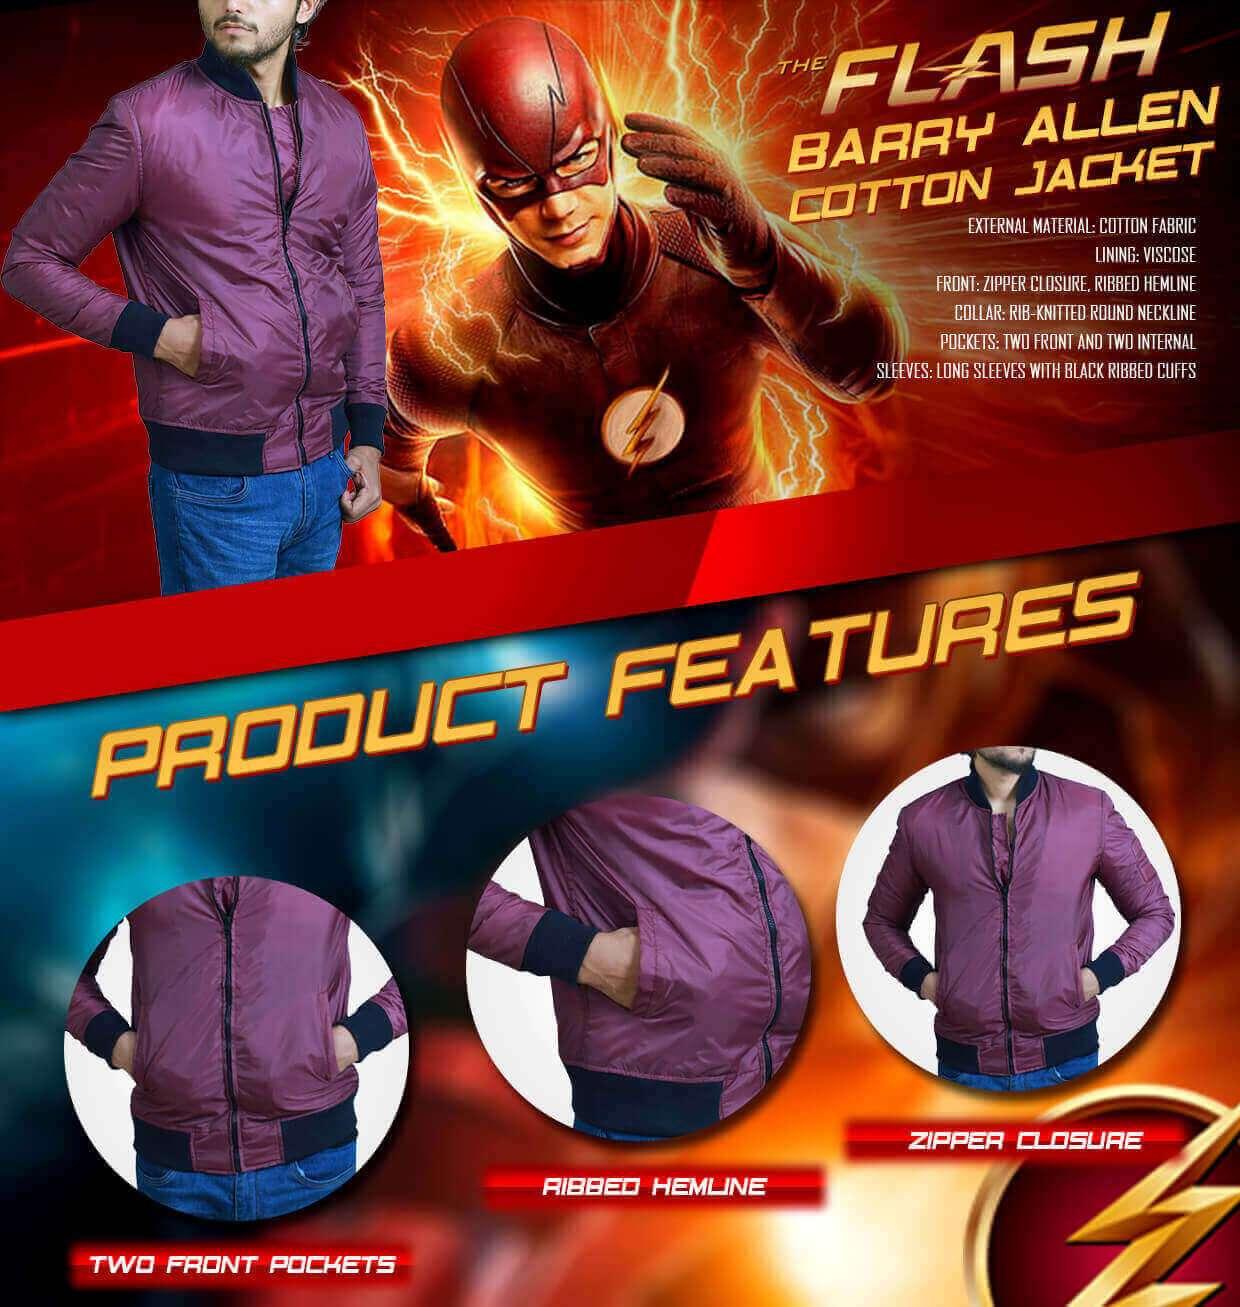 Grant Gustin The Flash Jacket